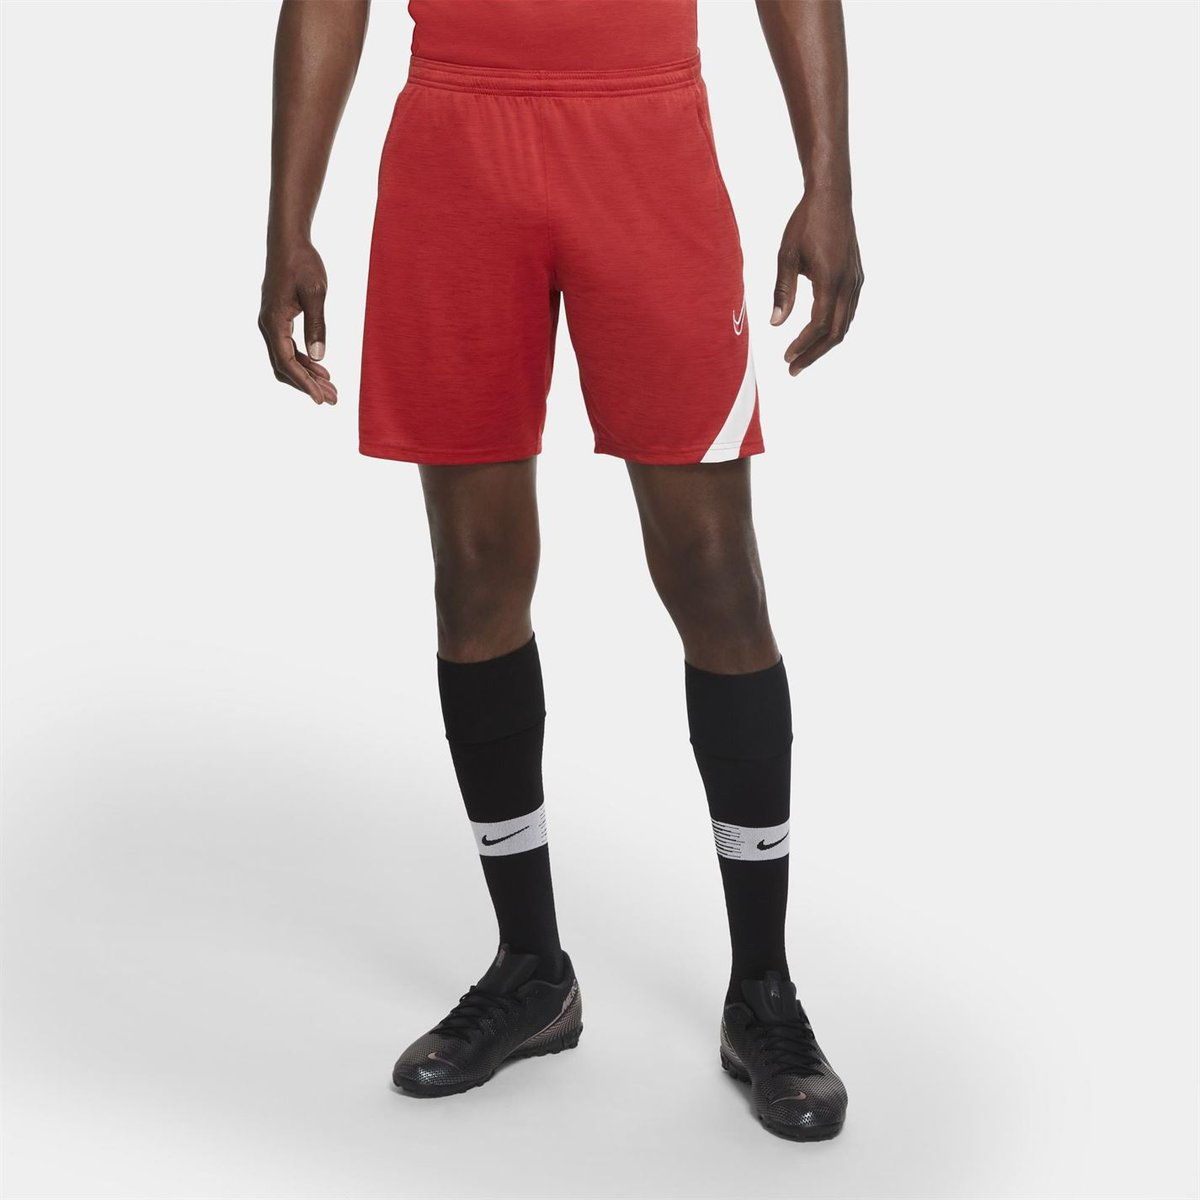 Dri FIT Academy Football Shorts Mens